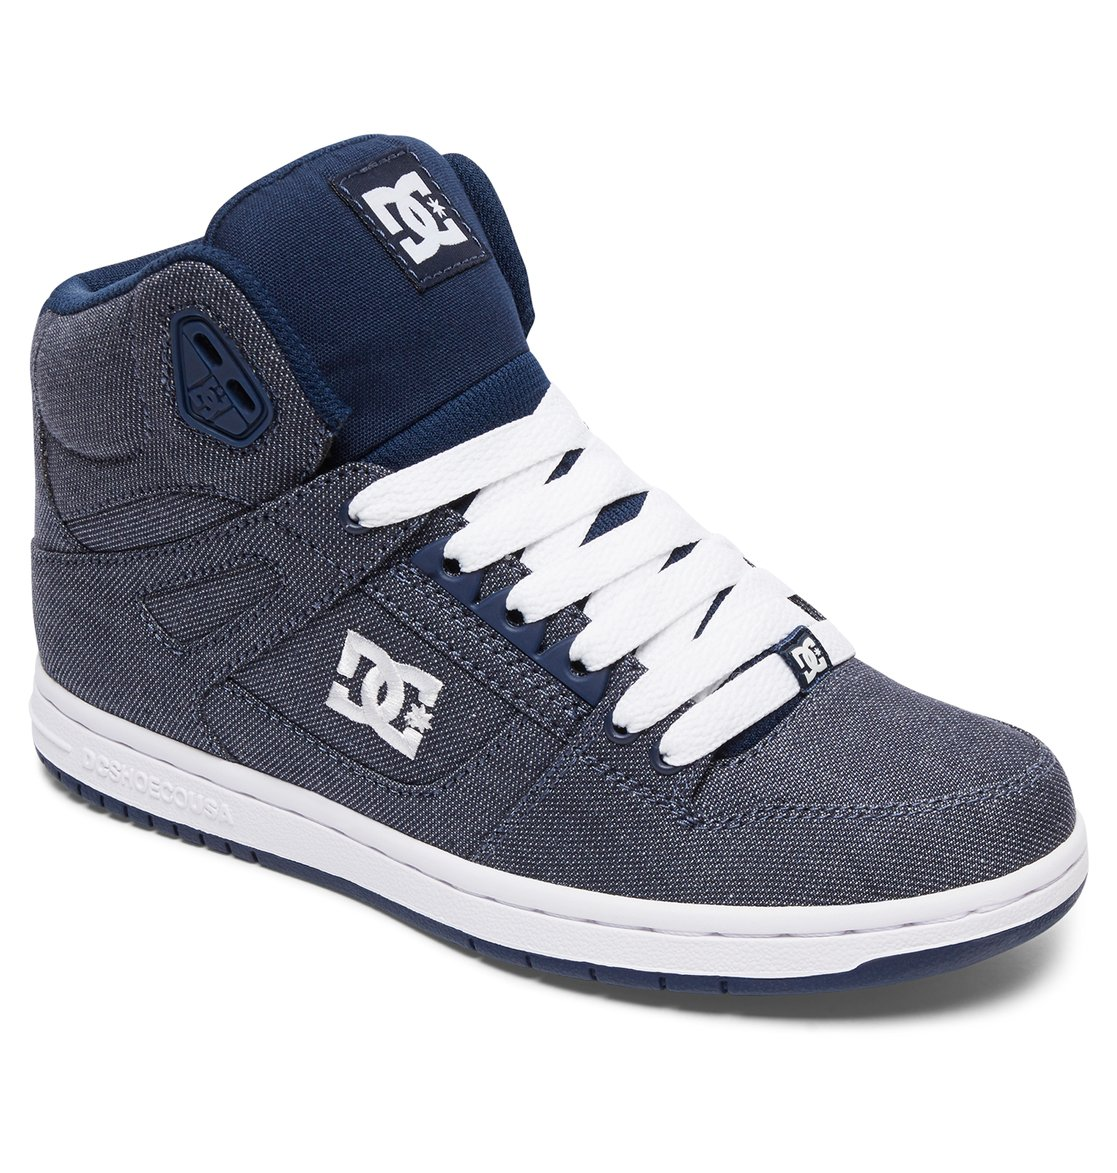 Dc Shoes Women 039 S Rebound High Tx